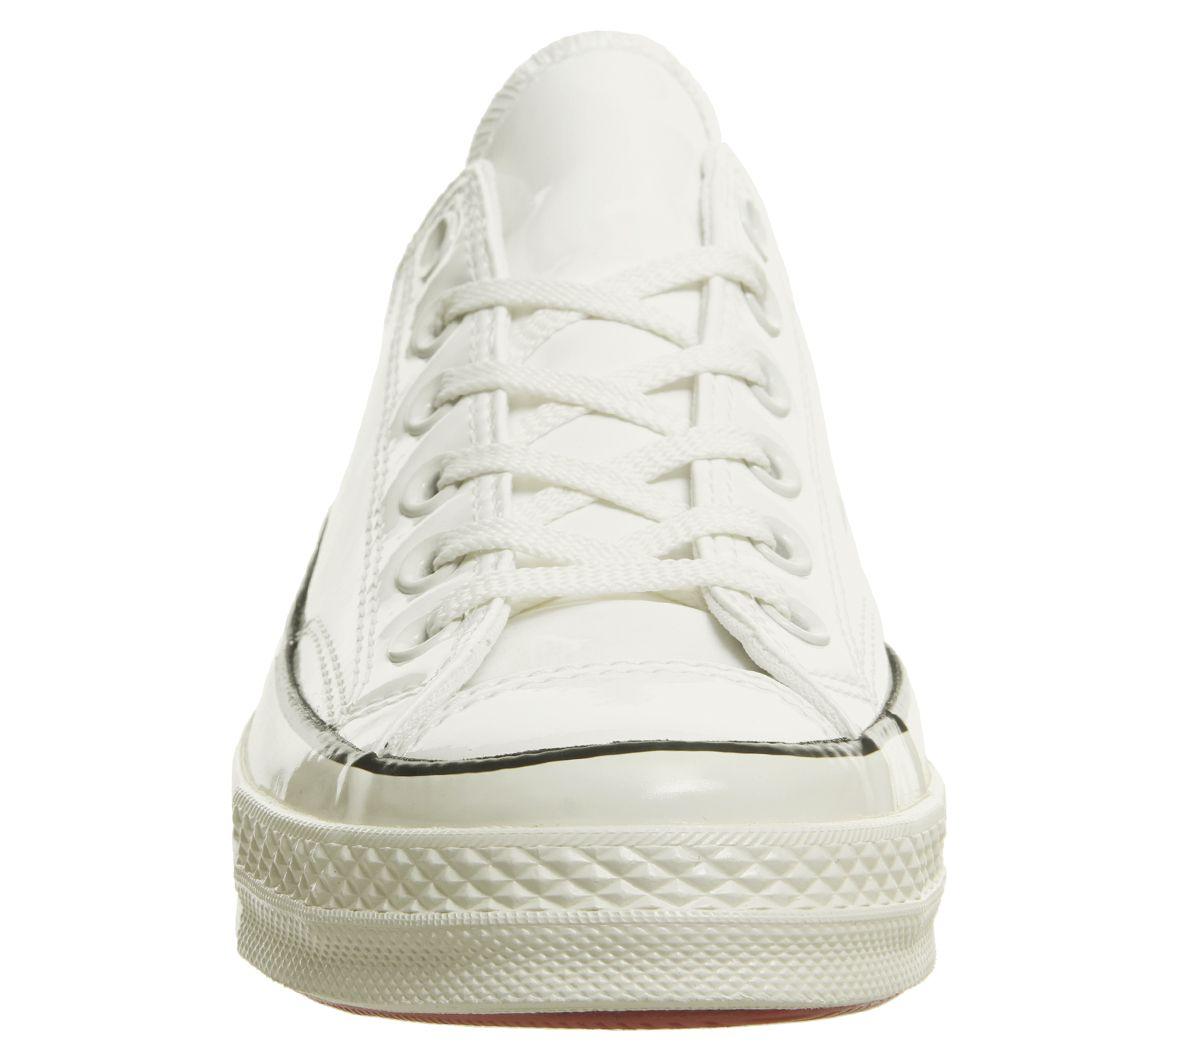 9f421a70255b Donna Converse All Star Ox ANNI  70 Scarpe Sportive Bianco Vintage ...